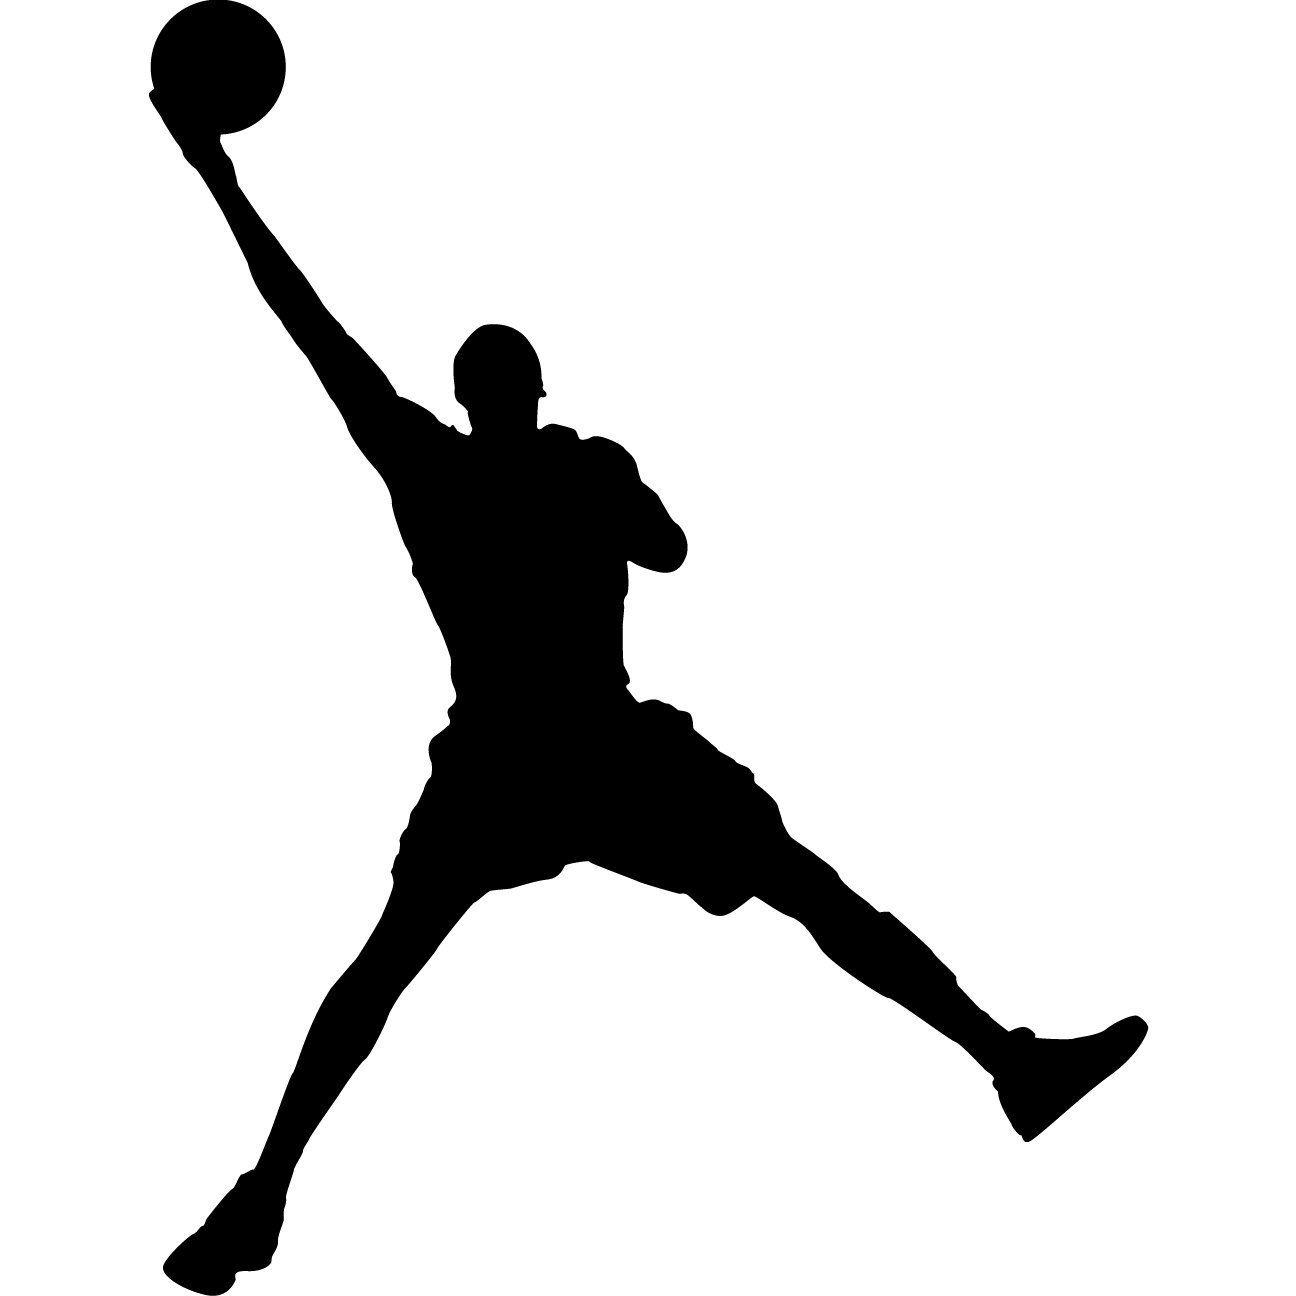 Basketball Silhouette Clip Art Jordan Basketball Wall Basketball Wall Decals Wall Decal Sticker